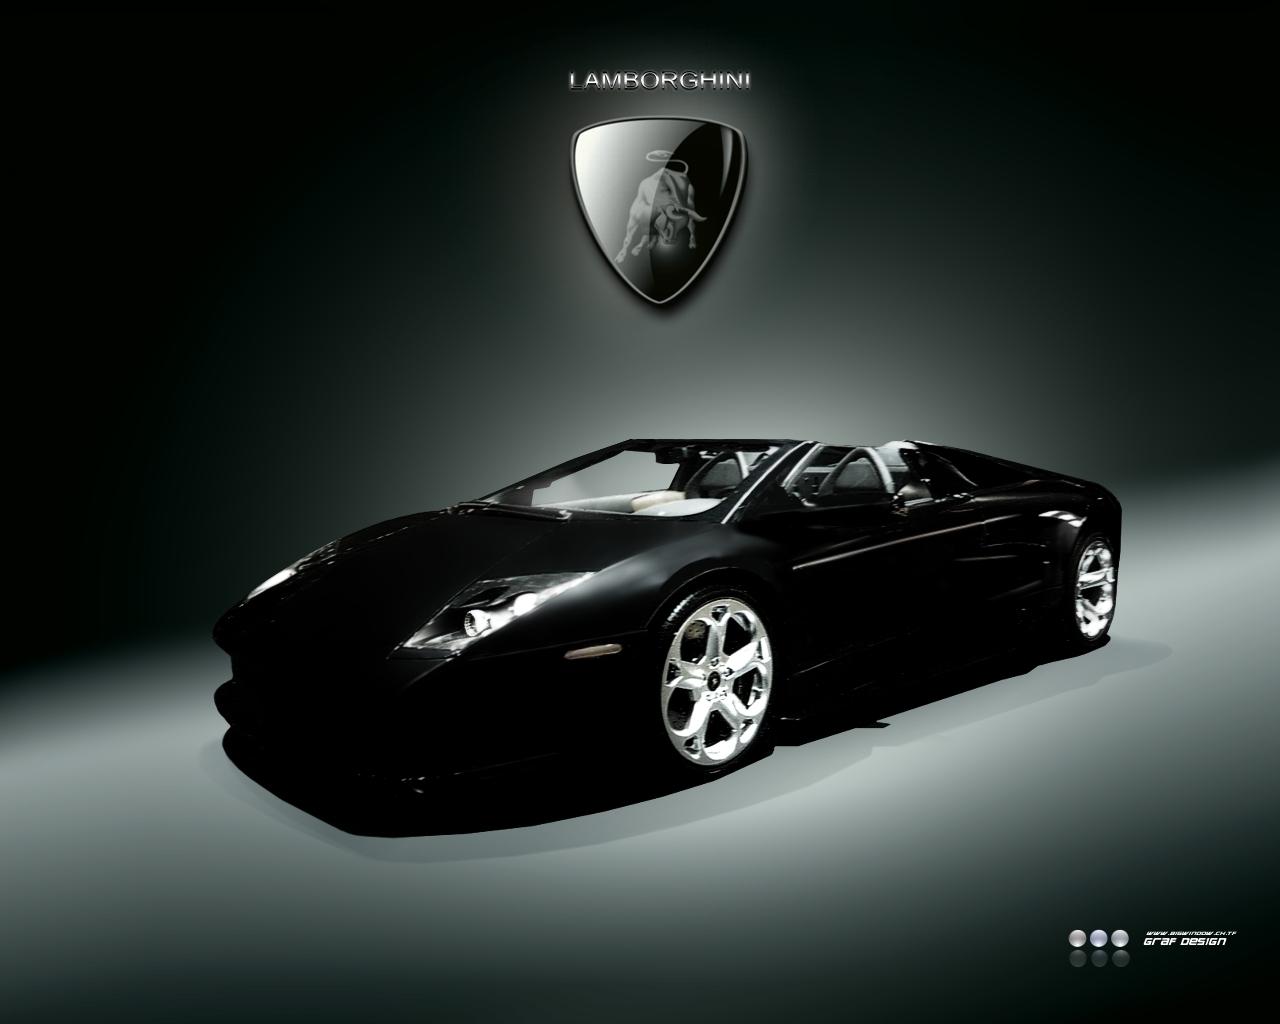 Lamborghini wallpaper lamborghini 1280x1024